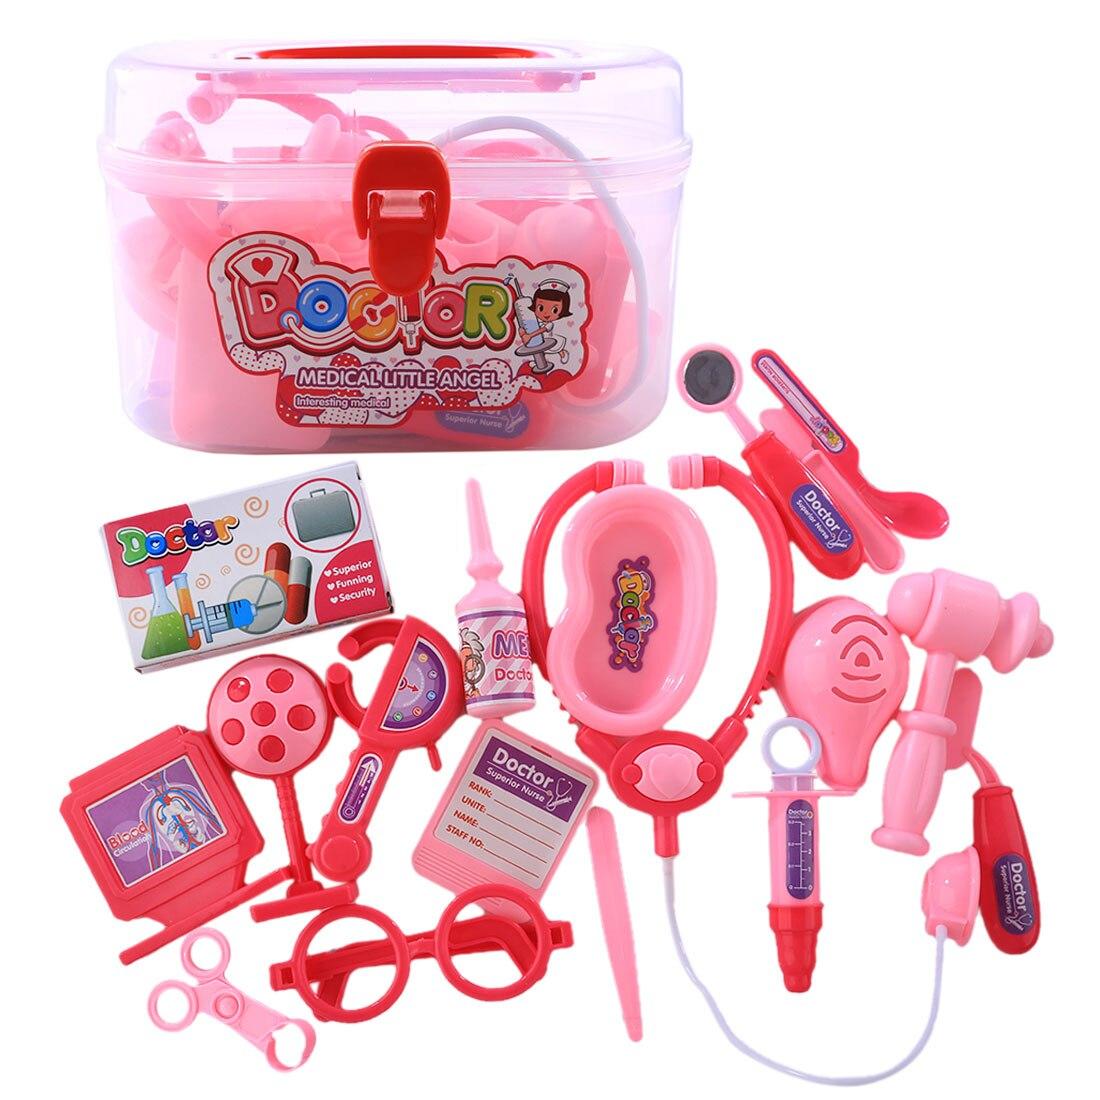 NFSTRIKE 20 Pcs/Set Pretend Play Doctor Toy